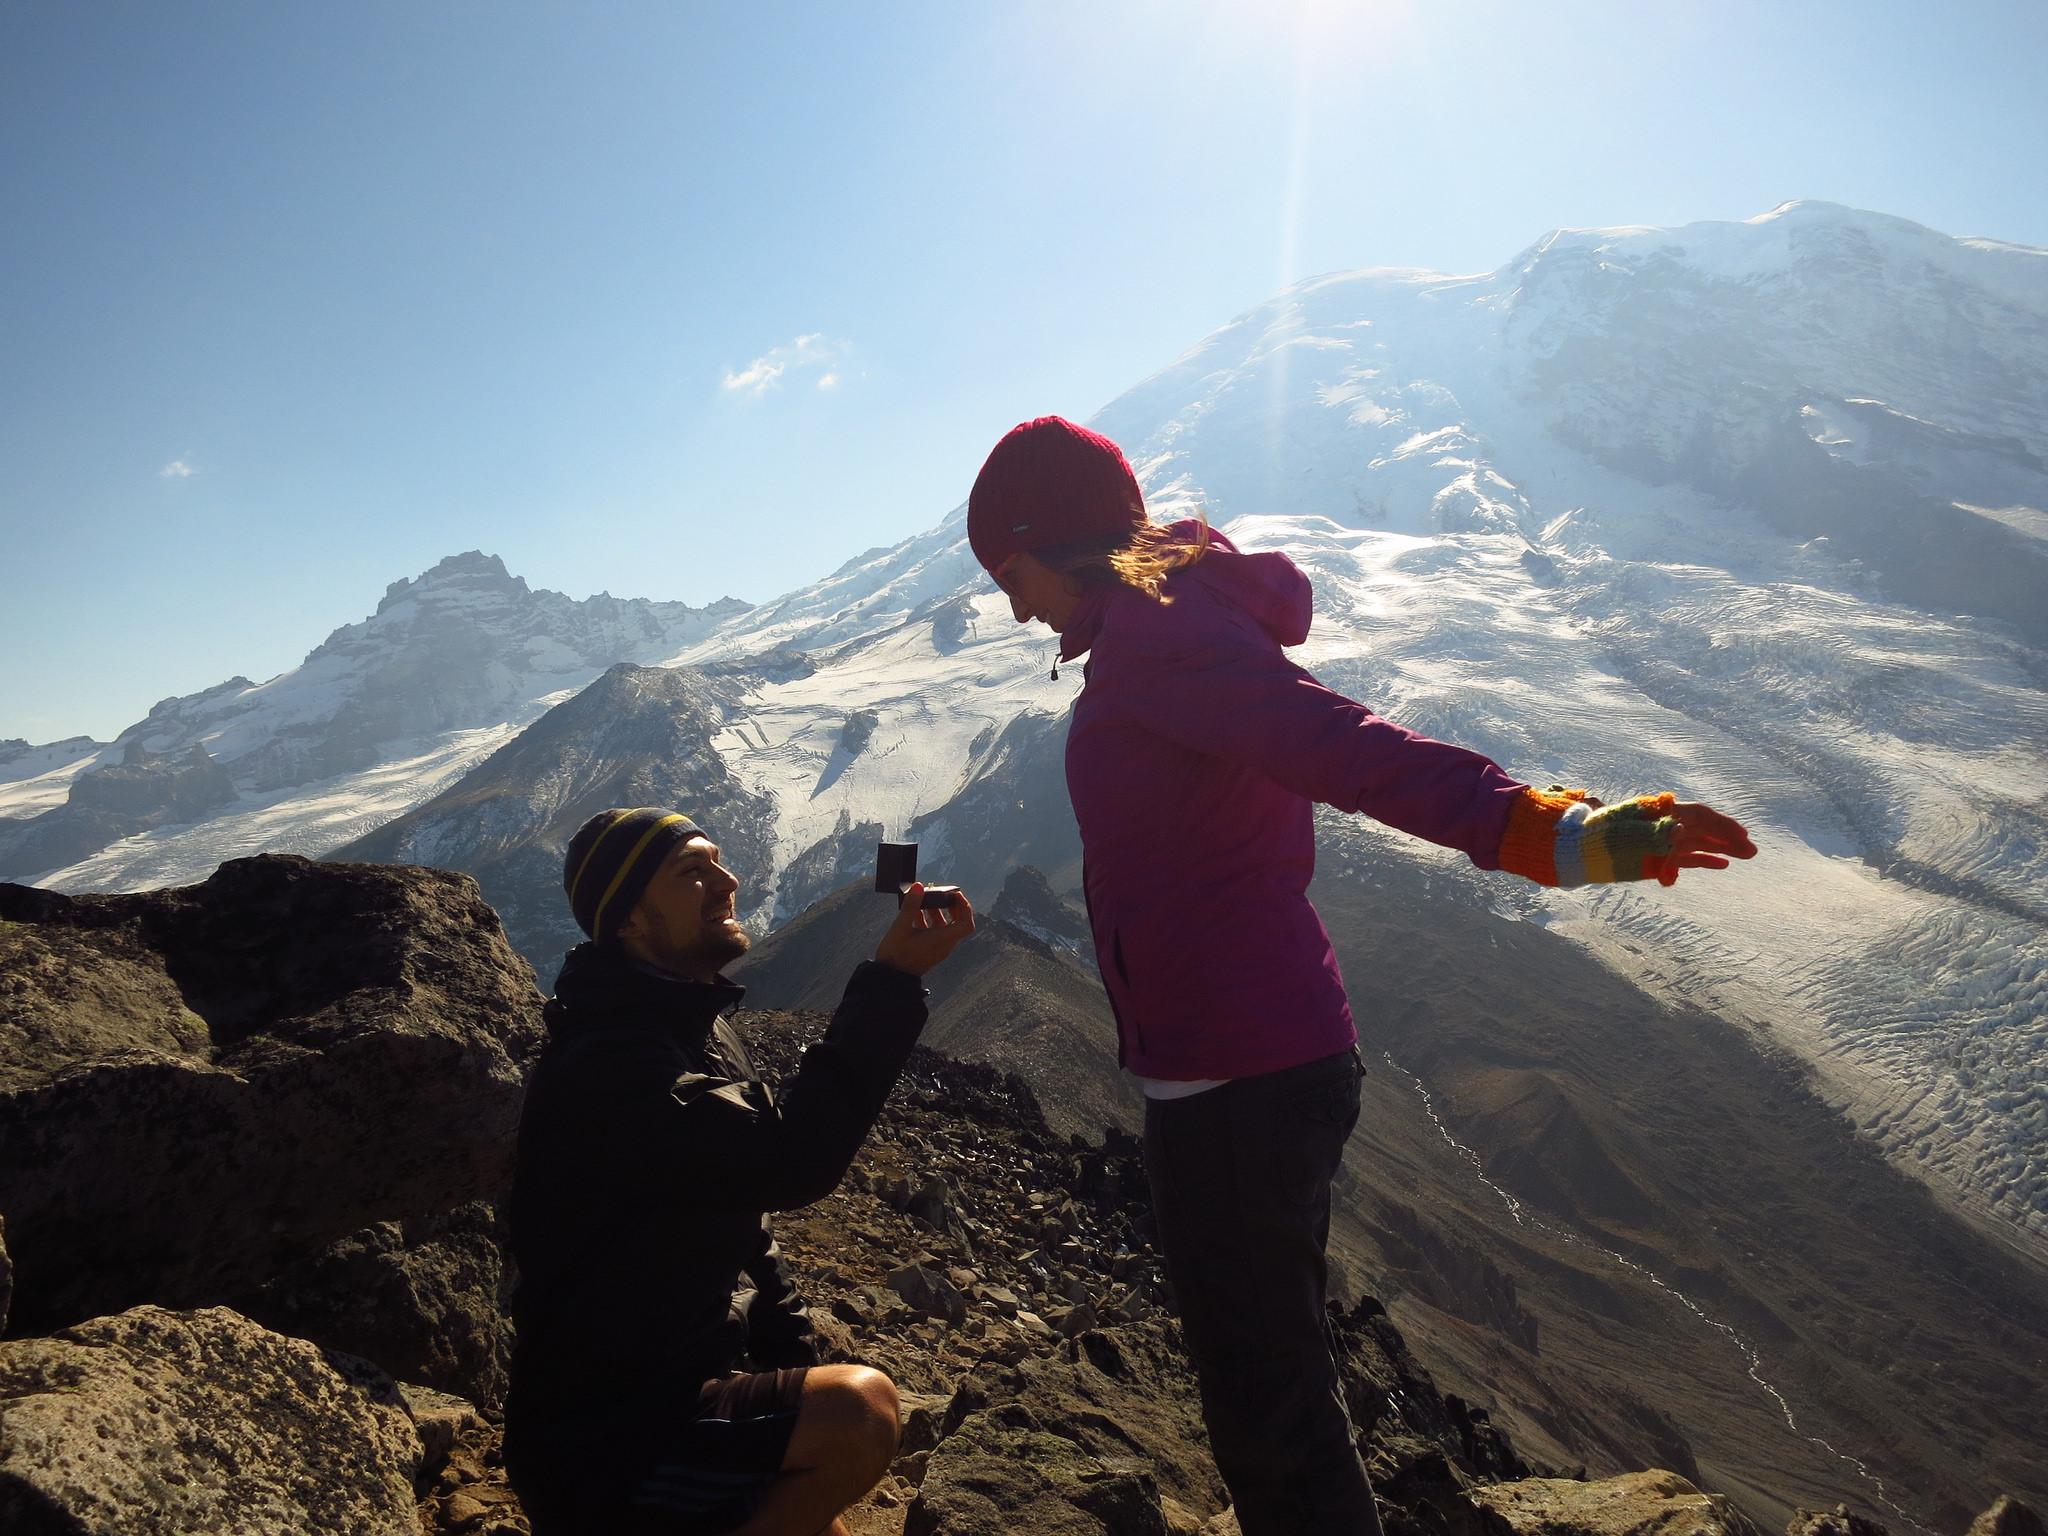 Engagement Burroughs Mt. Rainier by Simona Zamfir